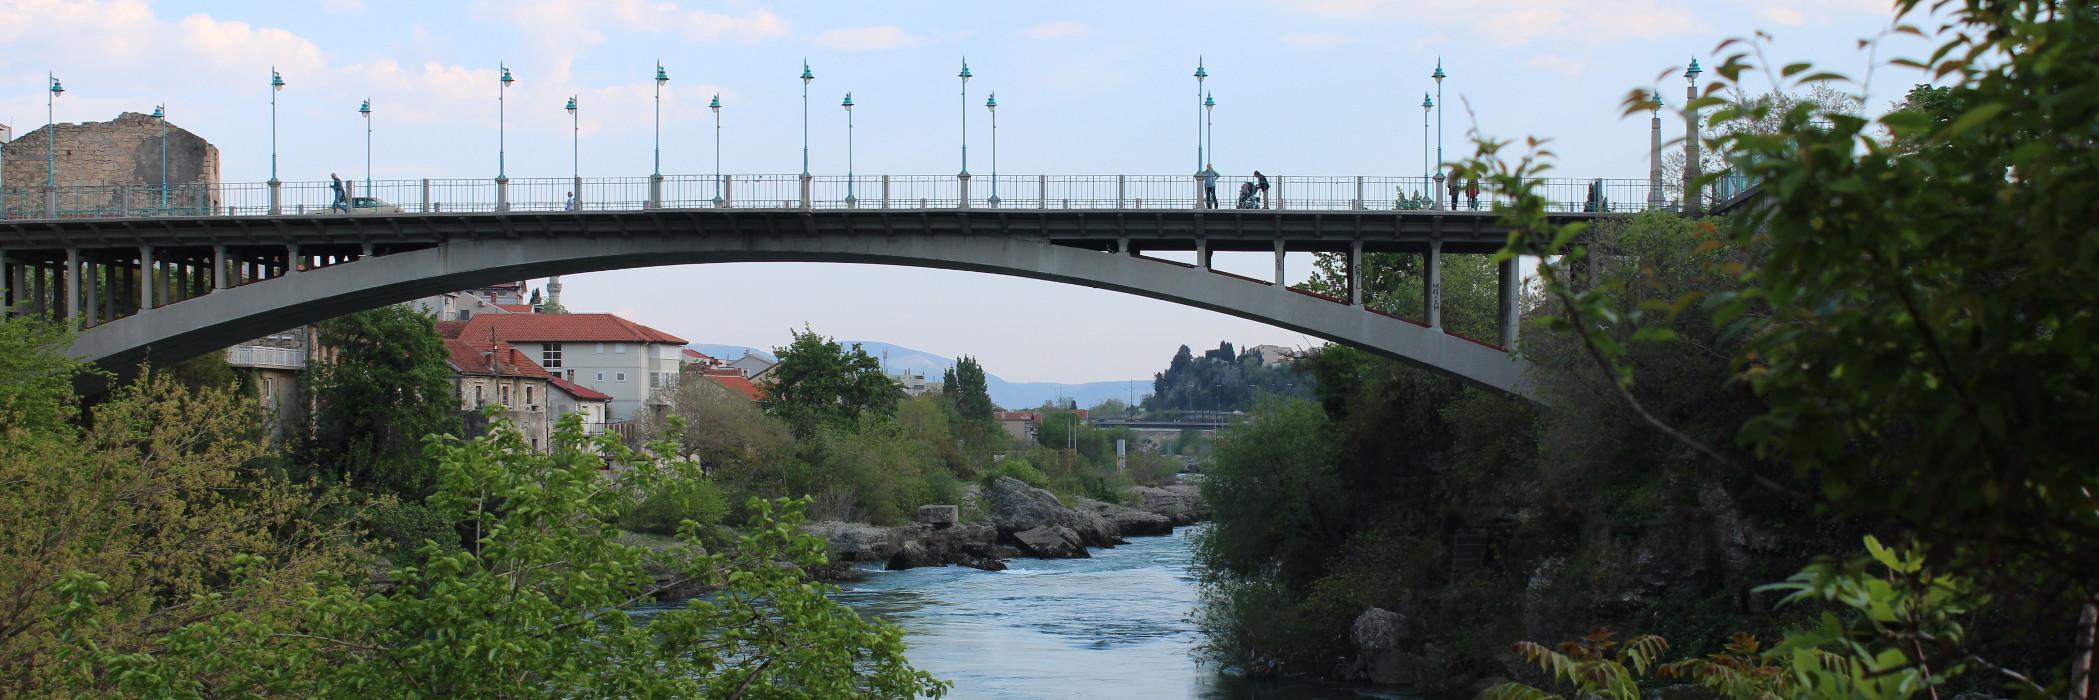 Лучский мост. Фото: Елена Арсениевич, CC BY-SA 3.0